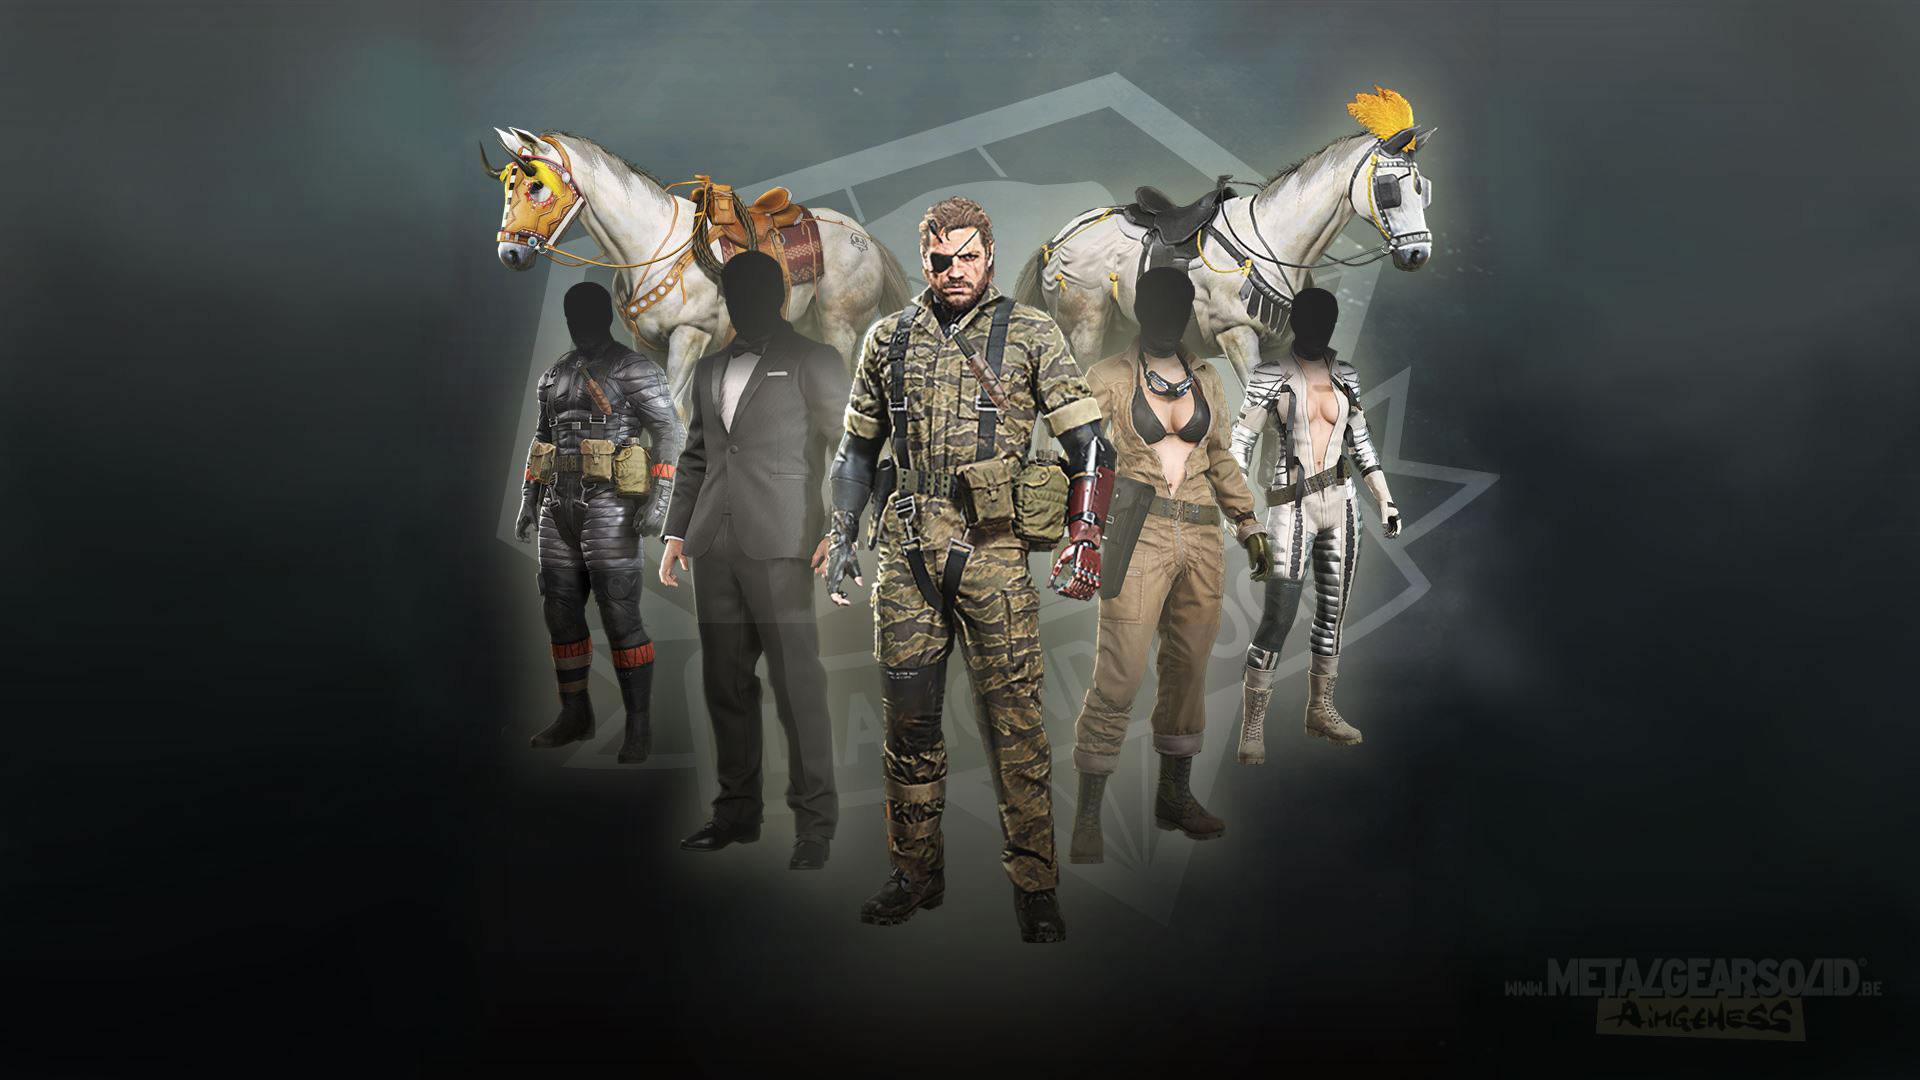 Costume DLC for Metal Gear Solid V: The Phantom Pain